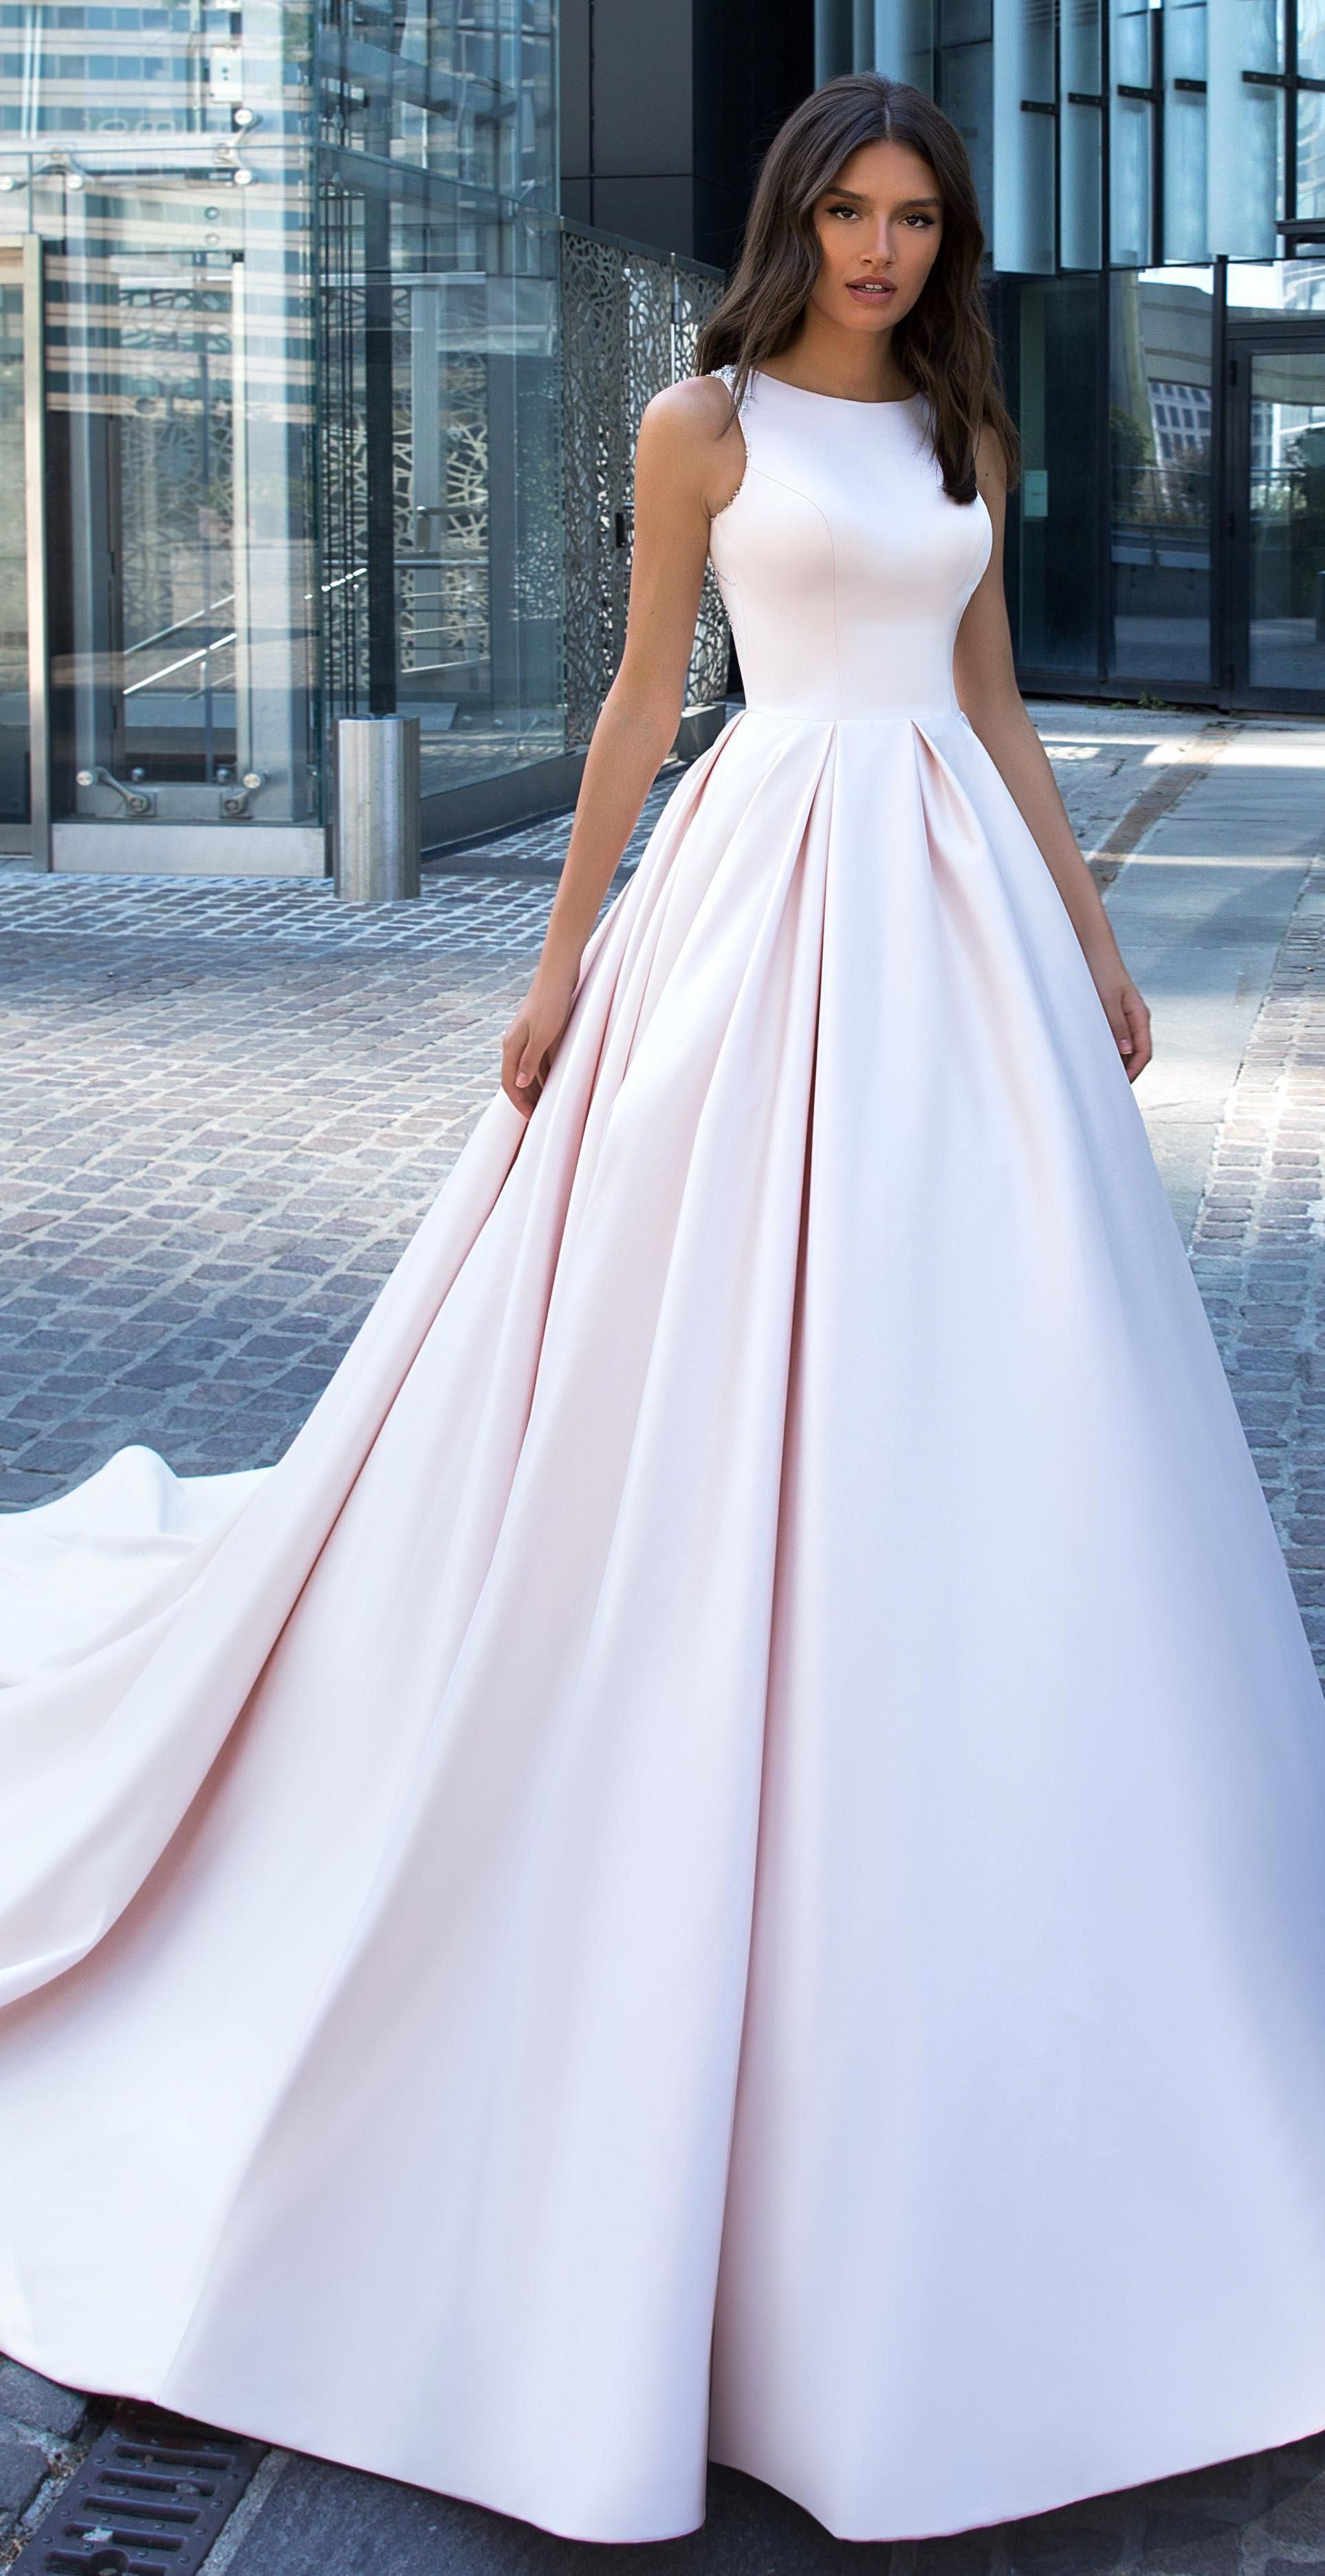 Crystal Designs Wedding Dresses 2019